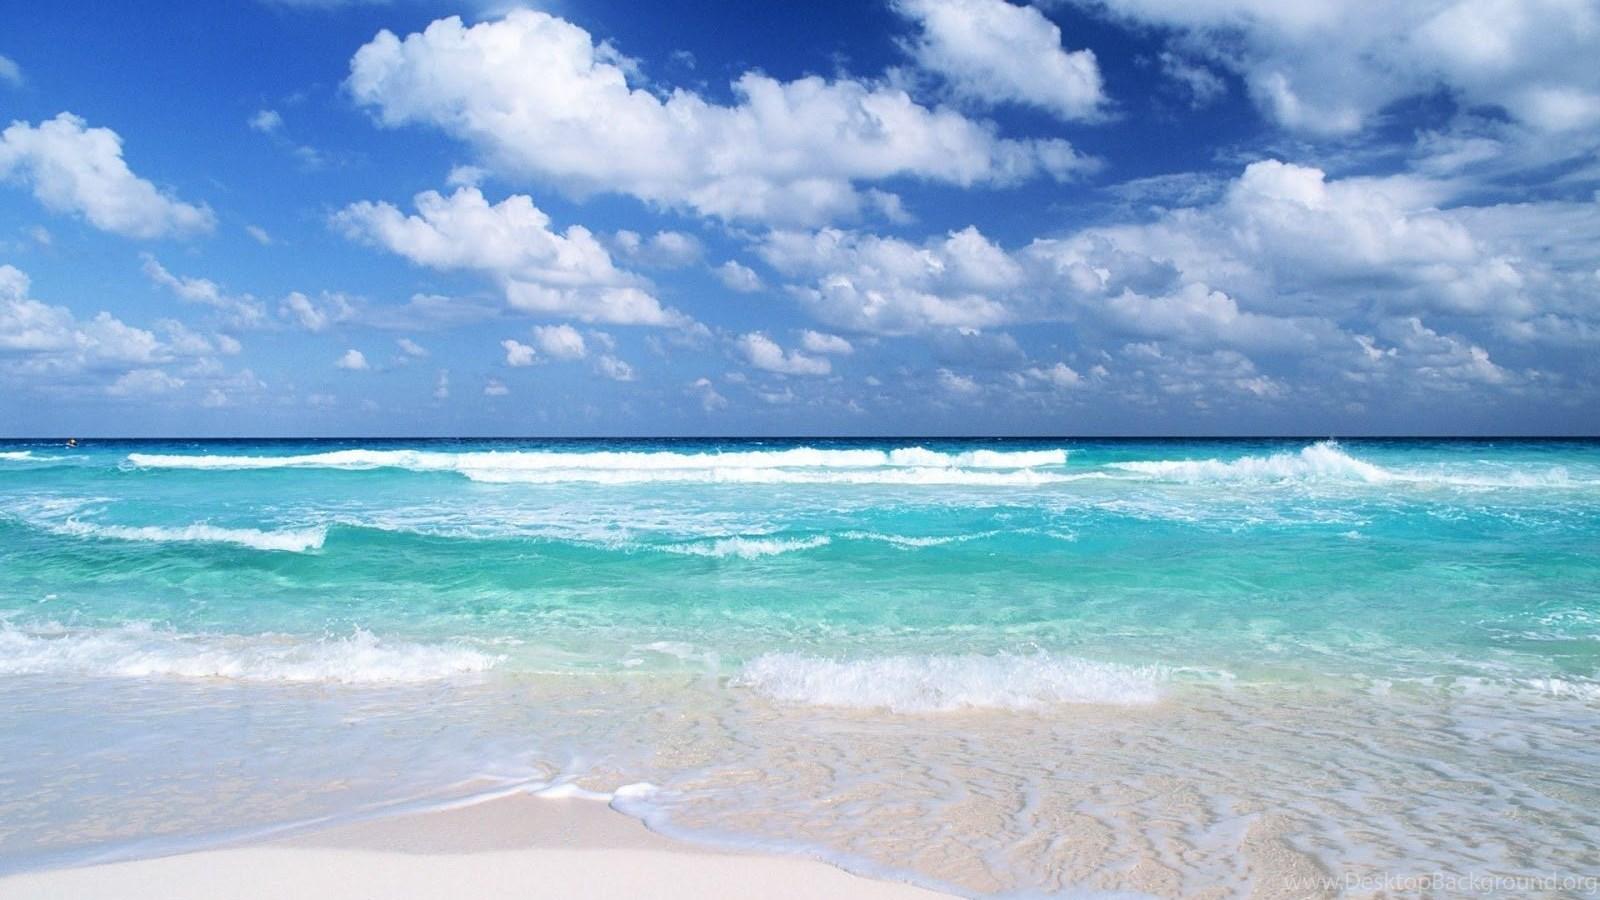 hd beach wallpapers , free beach wallpaper, beach wallpapers hd, hd